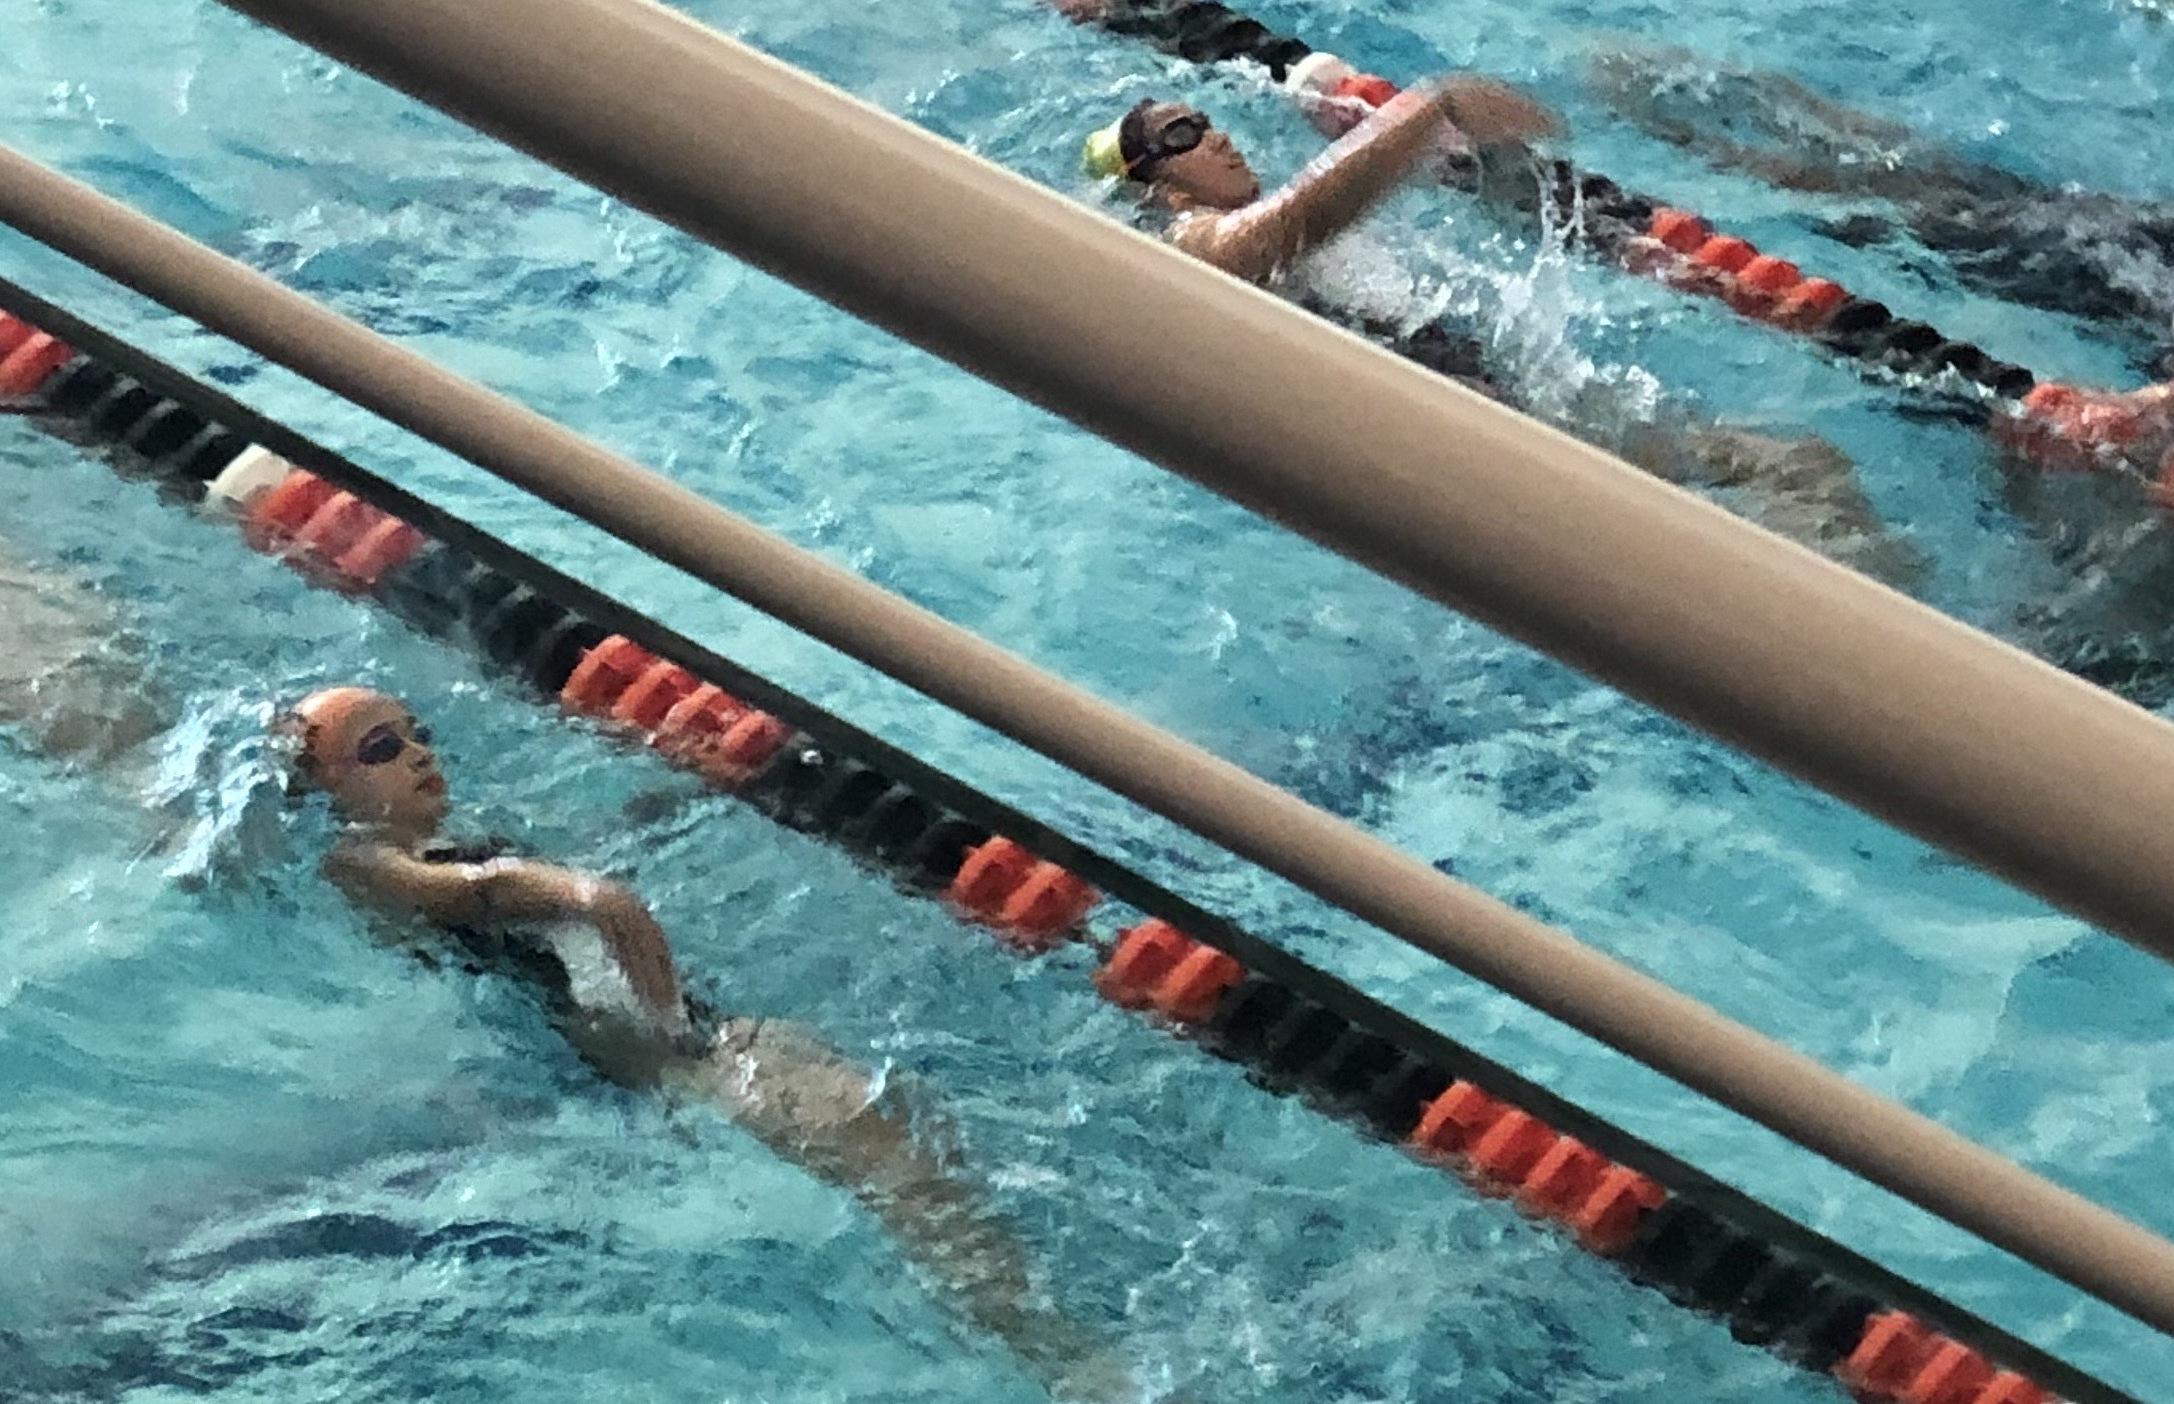 Swimmers at the Urbana Indoor Aquatic Center